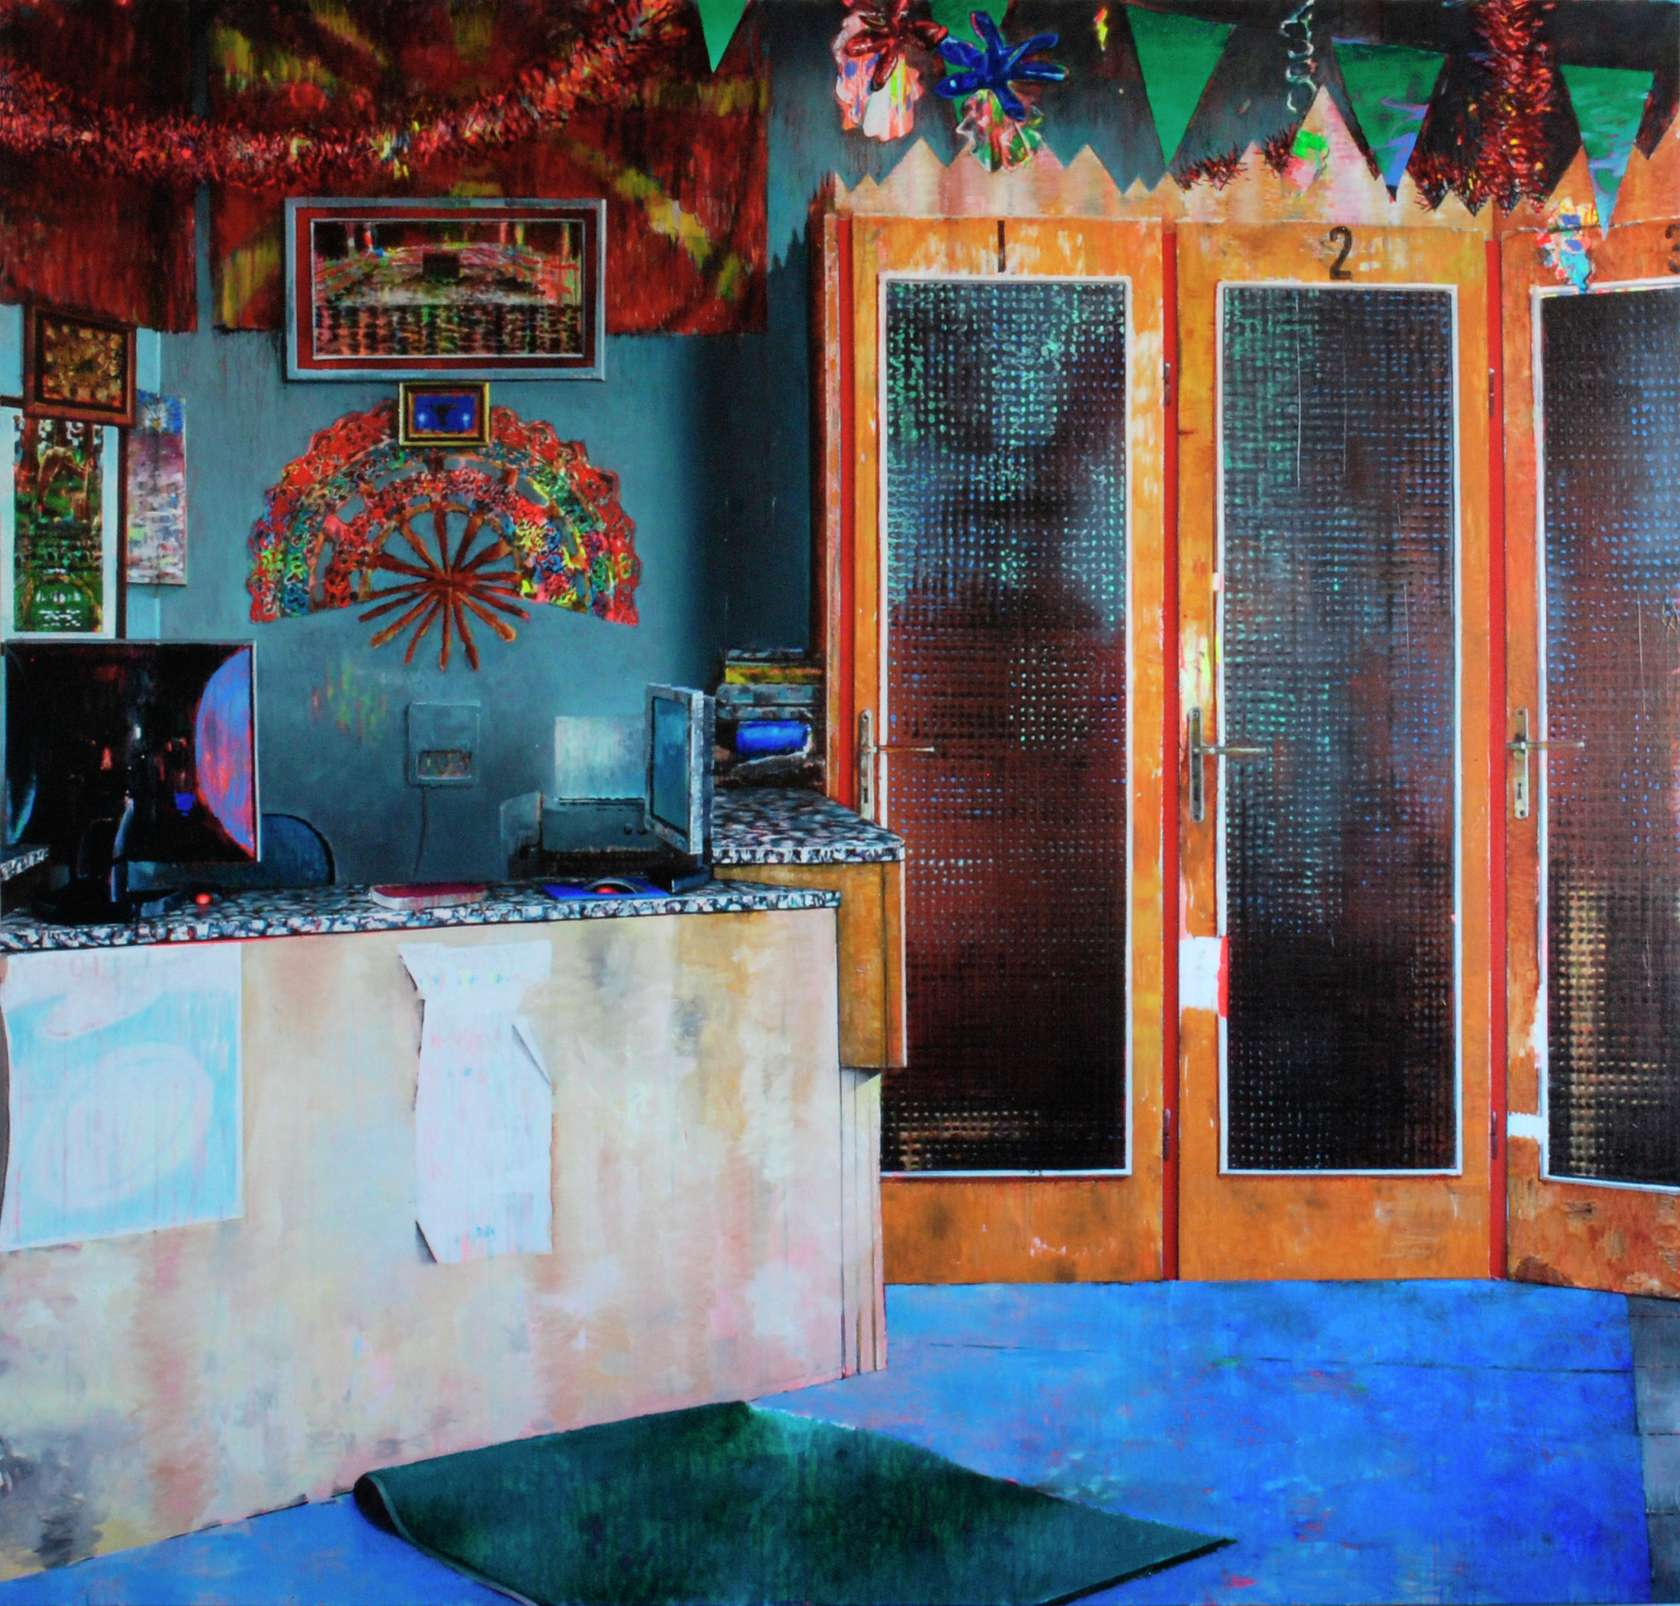 Laurent Proux, Taxiphone, Sonnenalle, Berlin (2), 2010 Huile sur toile210 × 220 cm / 82 5/8 × 86 5/8 in.